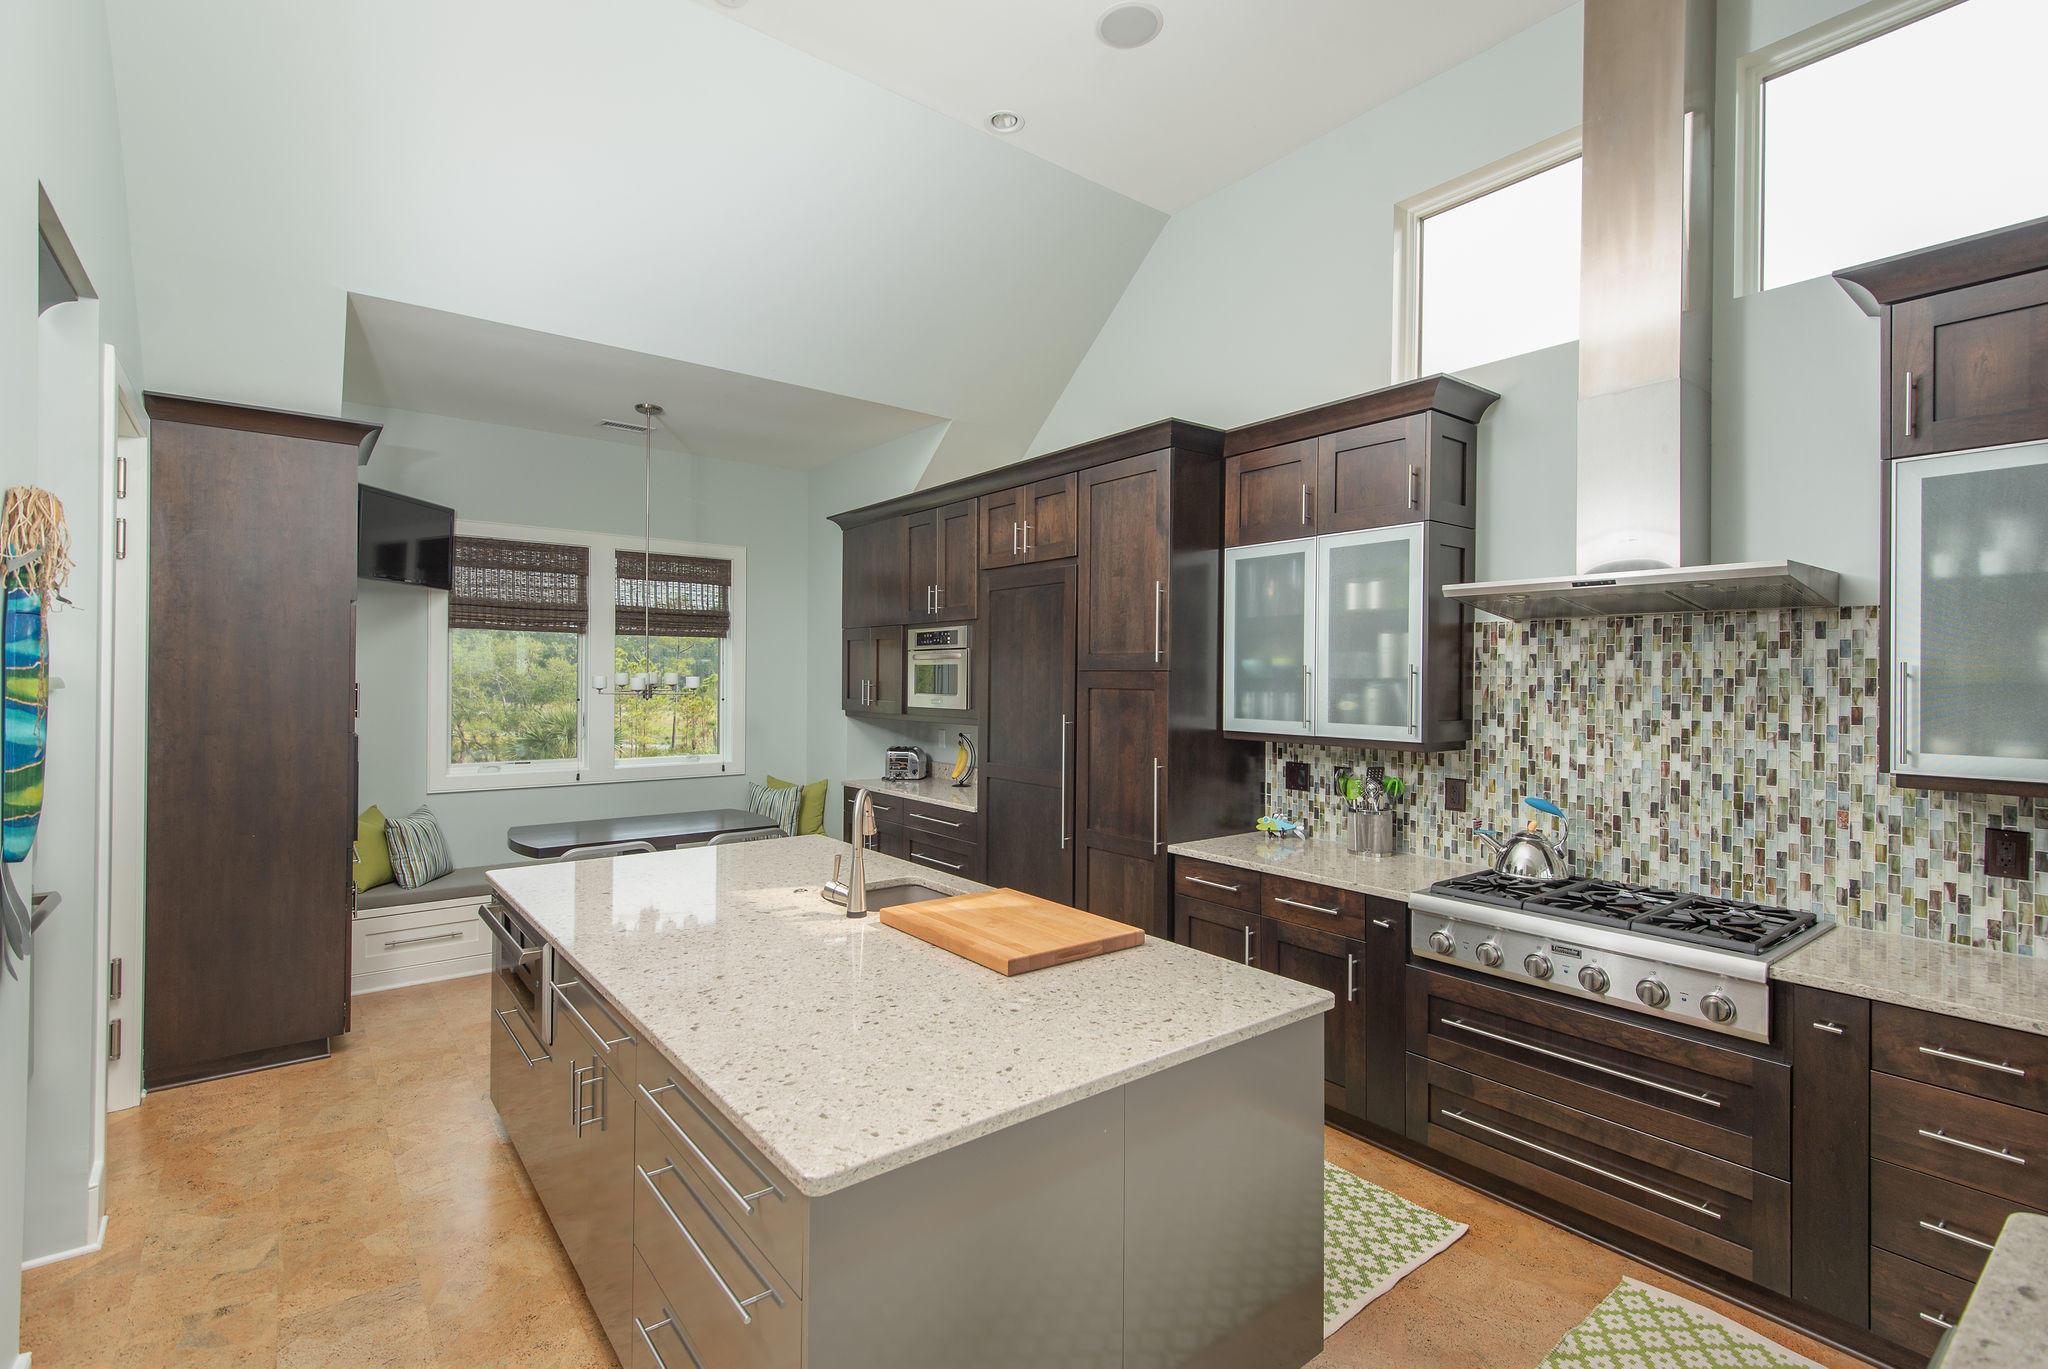 Seabrook Island Homes For Sale - 3135 Marshgate, Seabrook Island, SC - 49